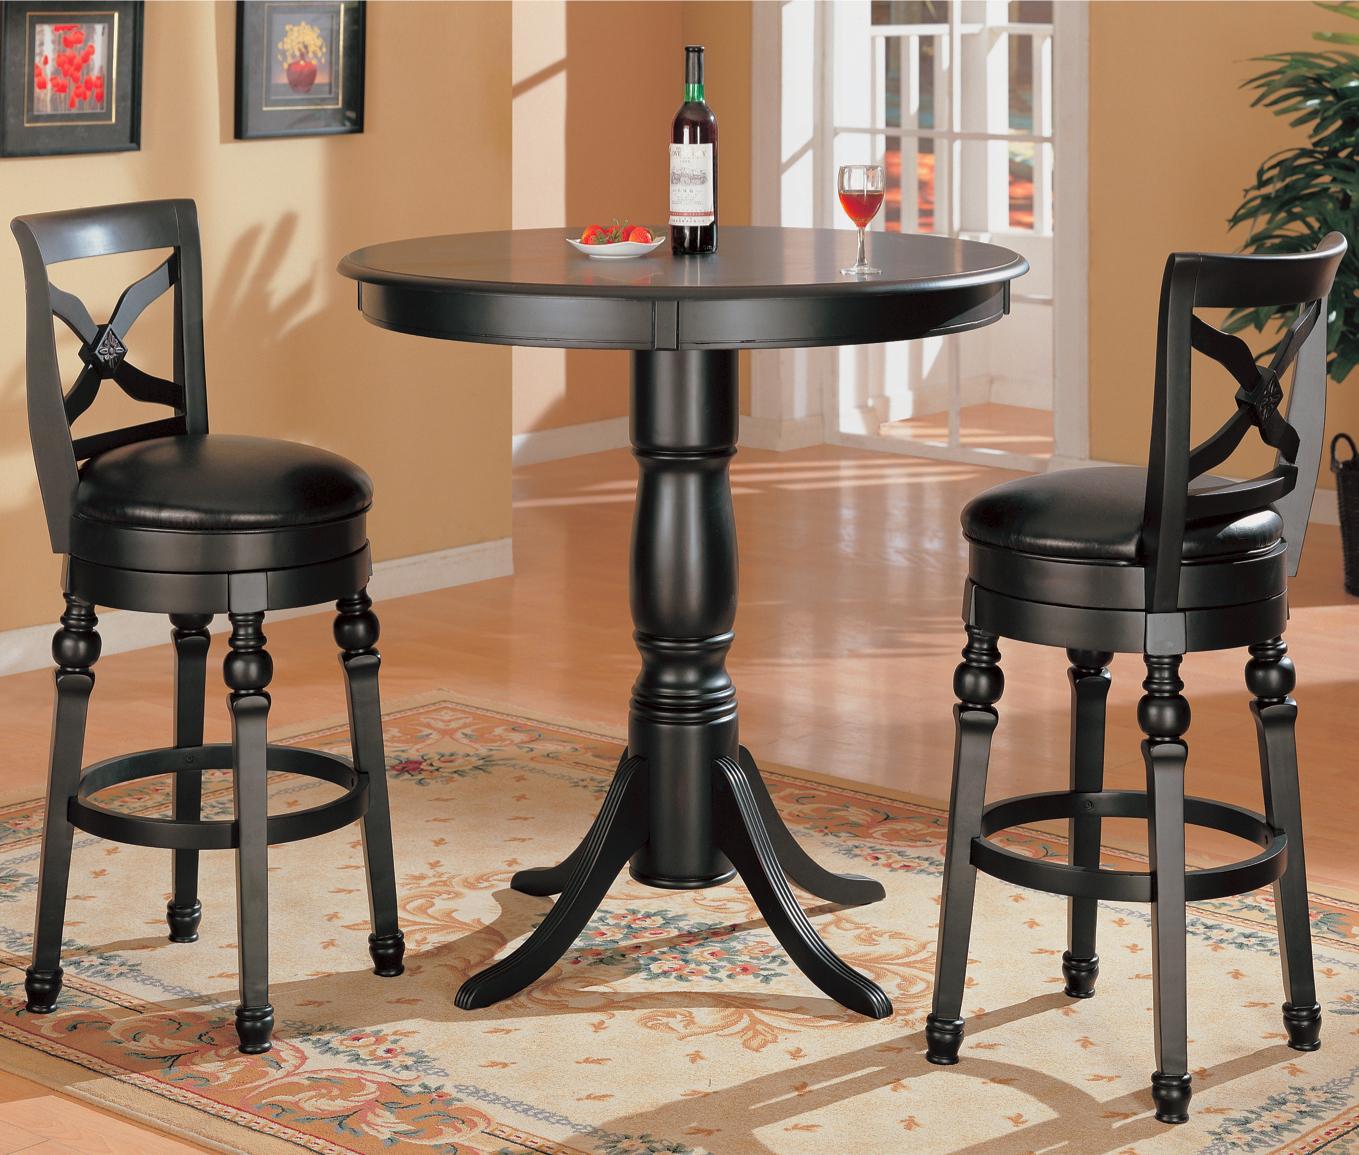 Coaster Lathrop 3 Piece Bar Table Set Value City Furniture Pub Table And Stool Sets